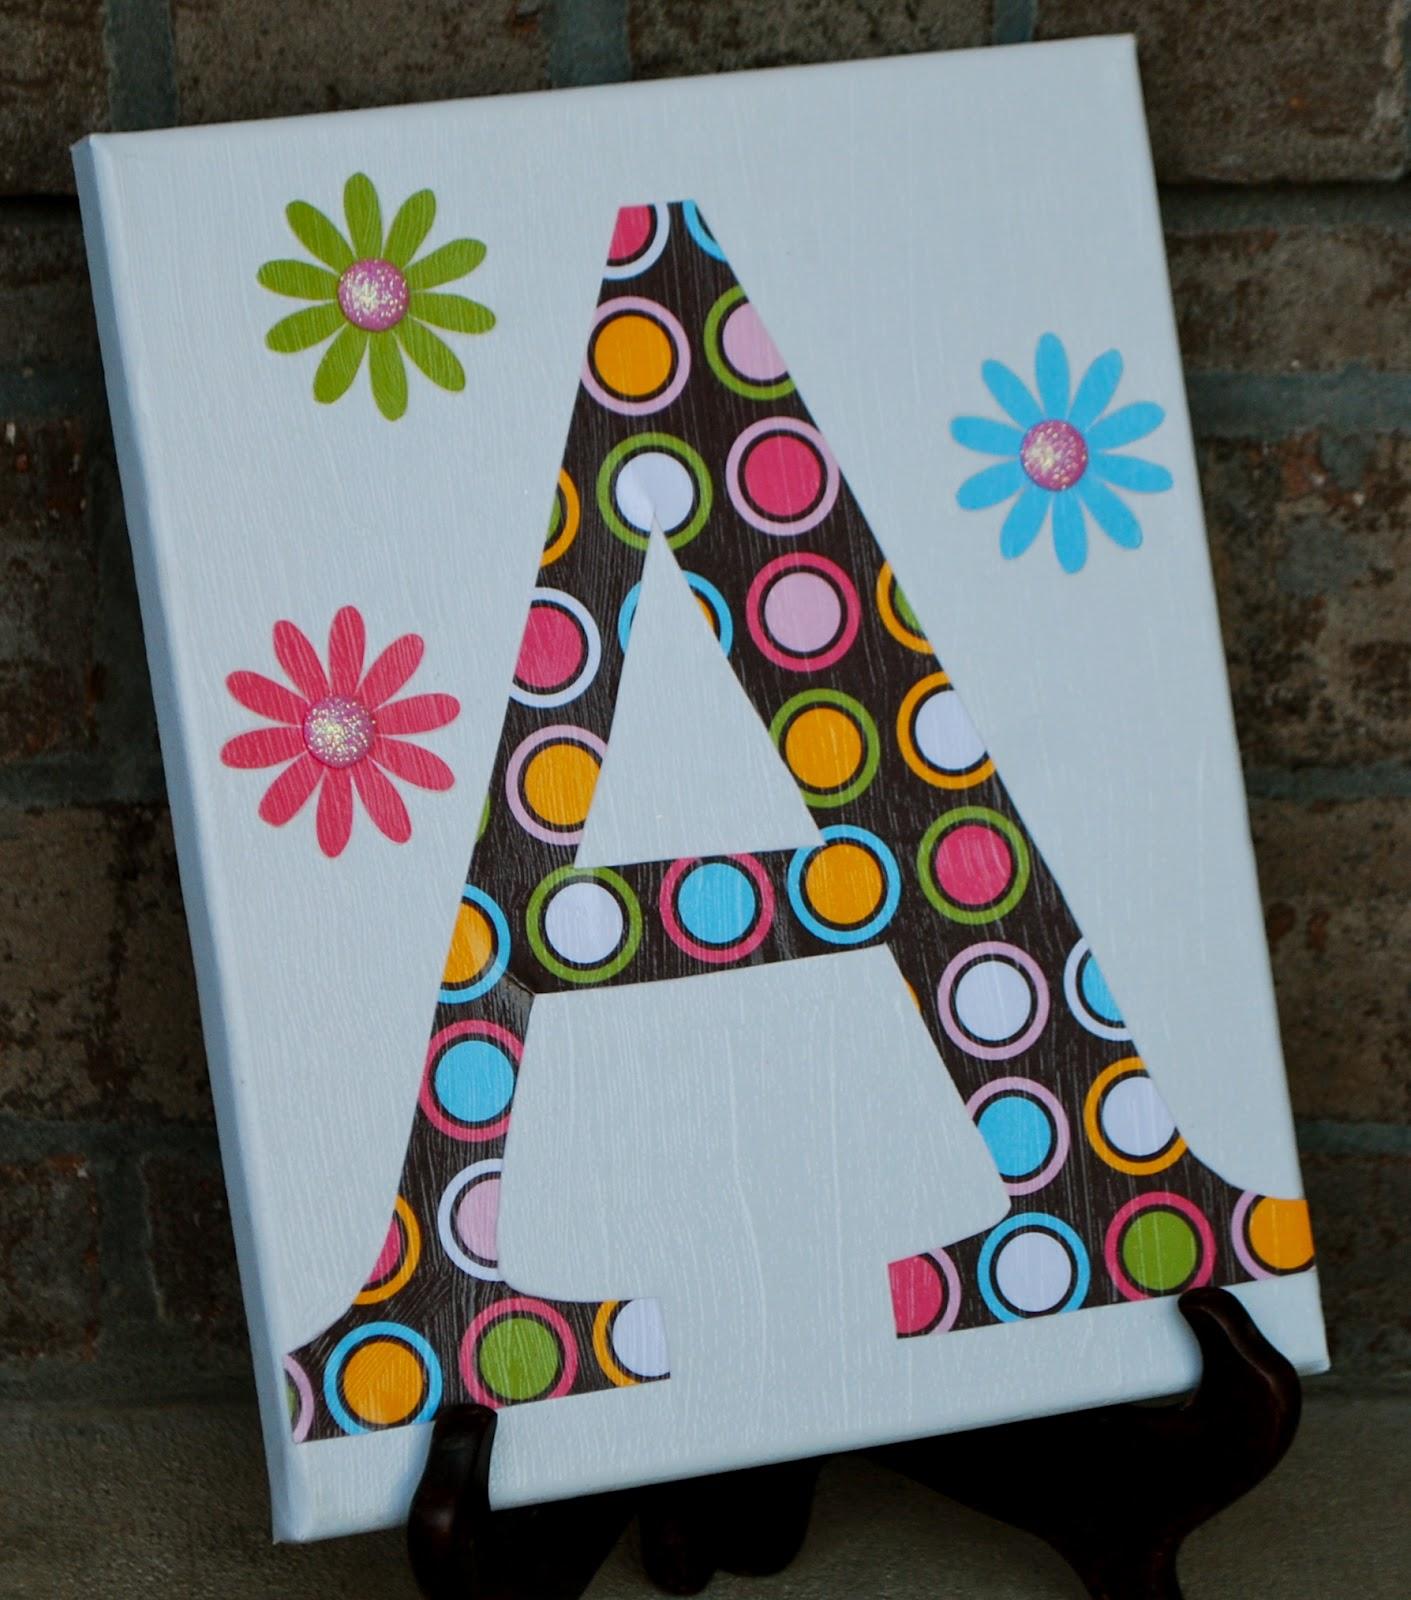 Mod Podge Canvas Projects - Amanda Jane Brown